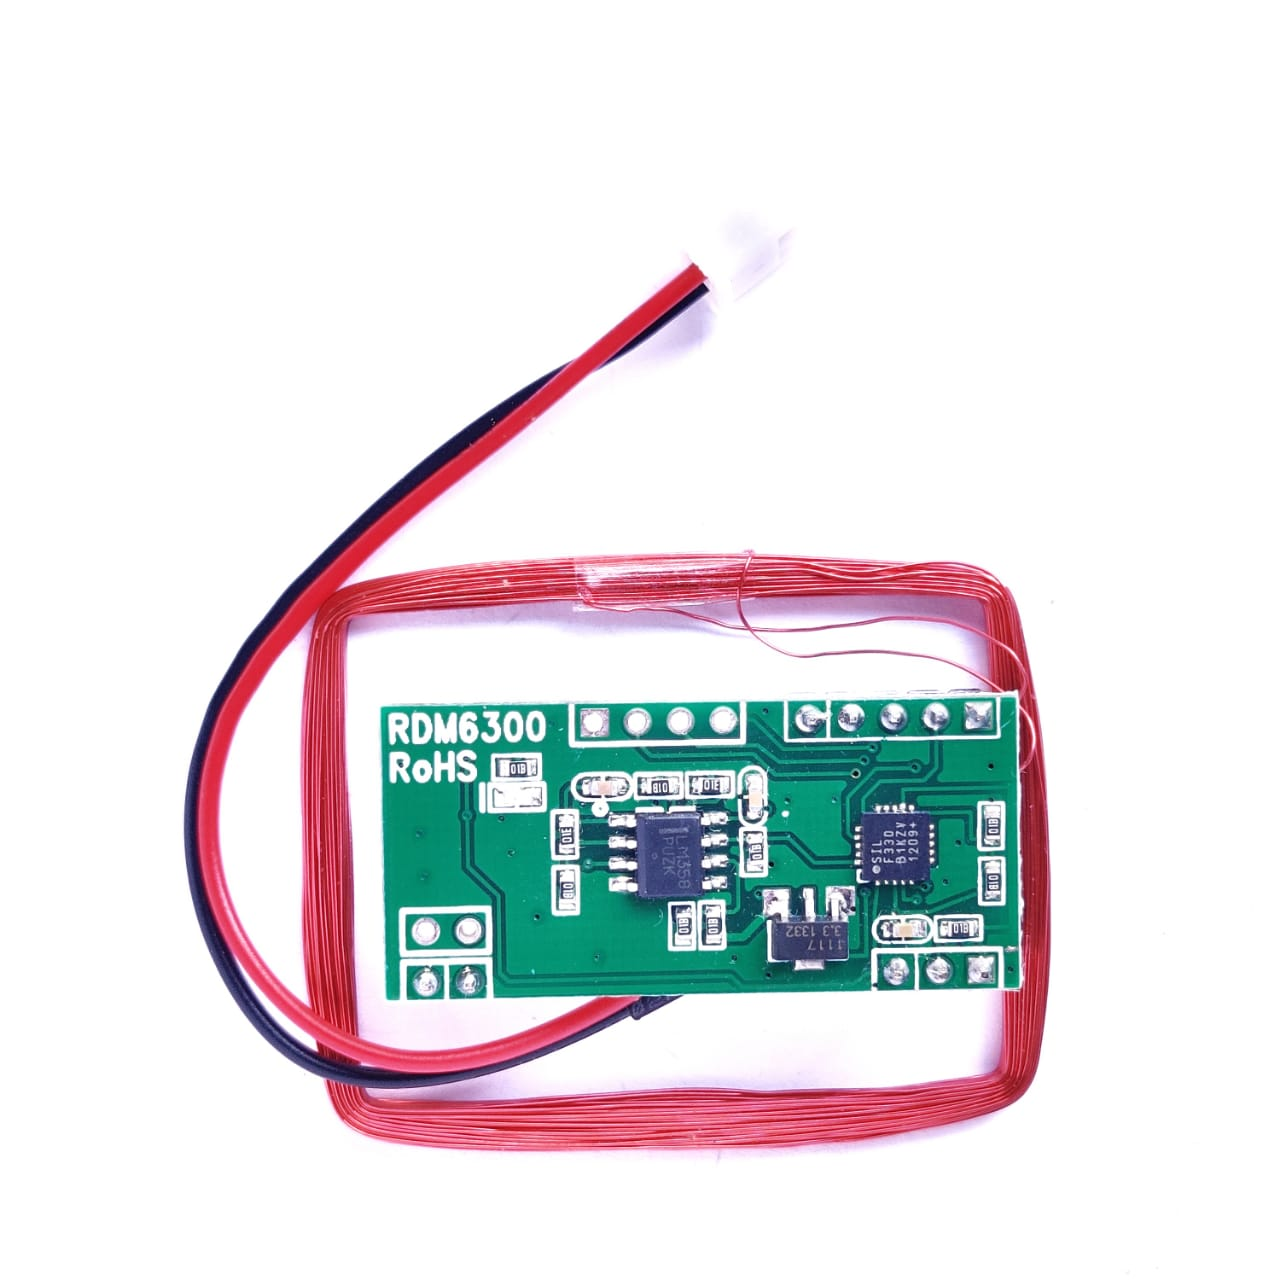 RFID - RDM6300 (125KHZ)